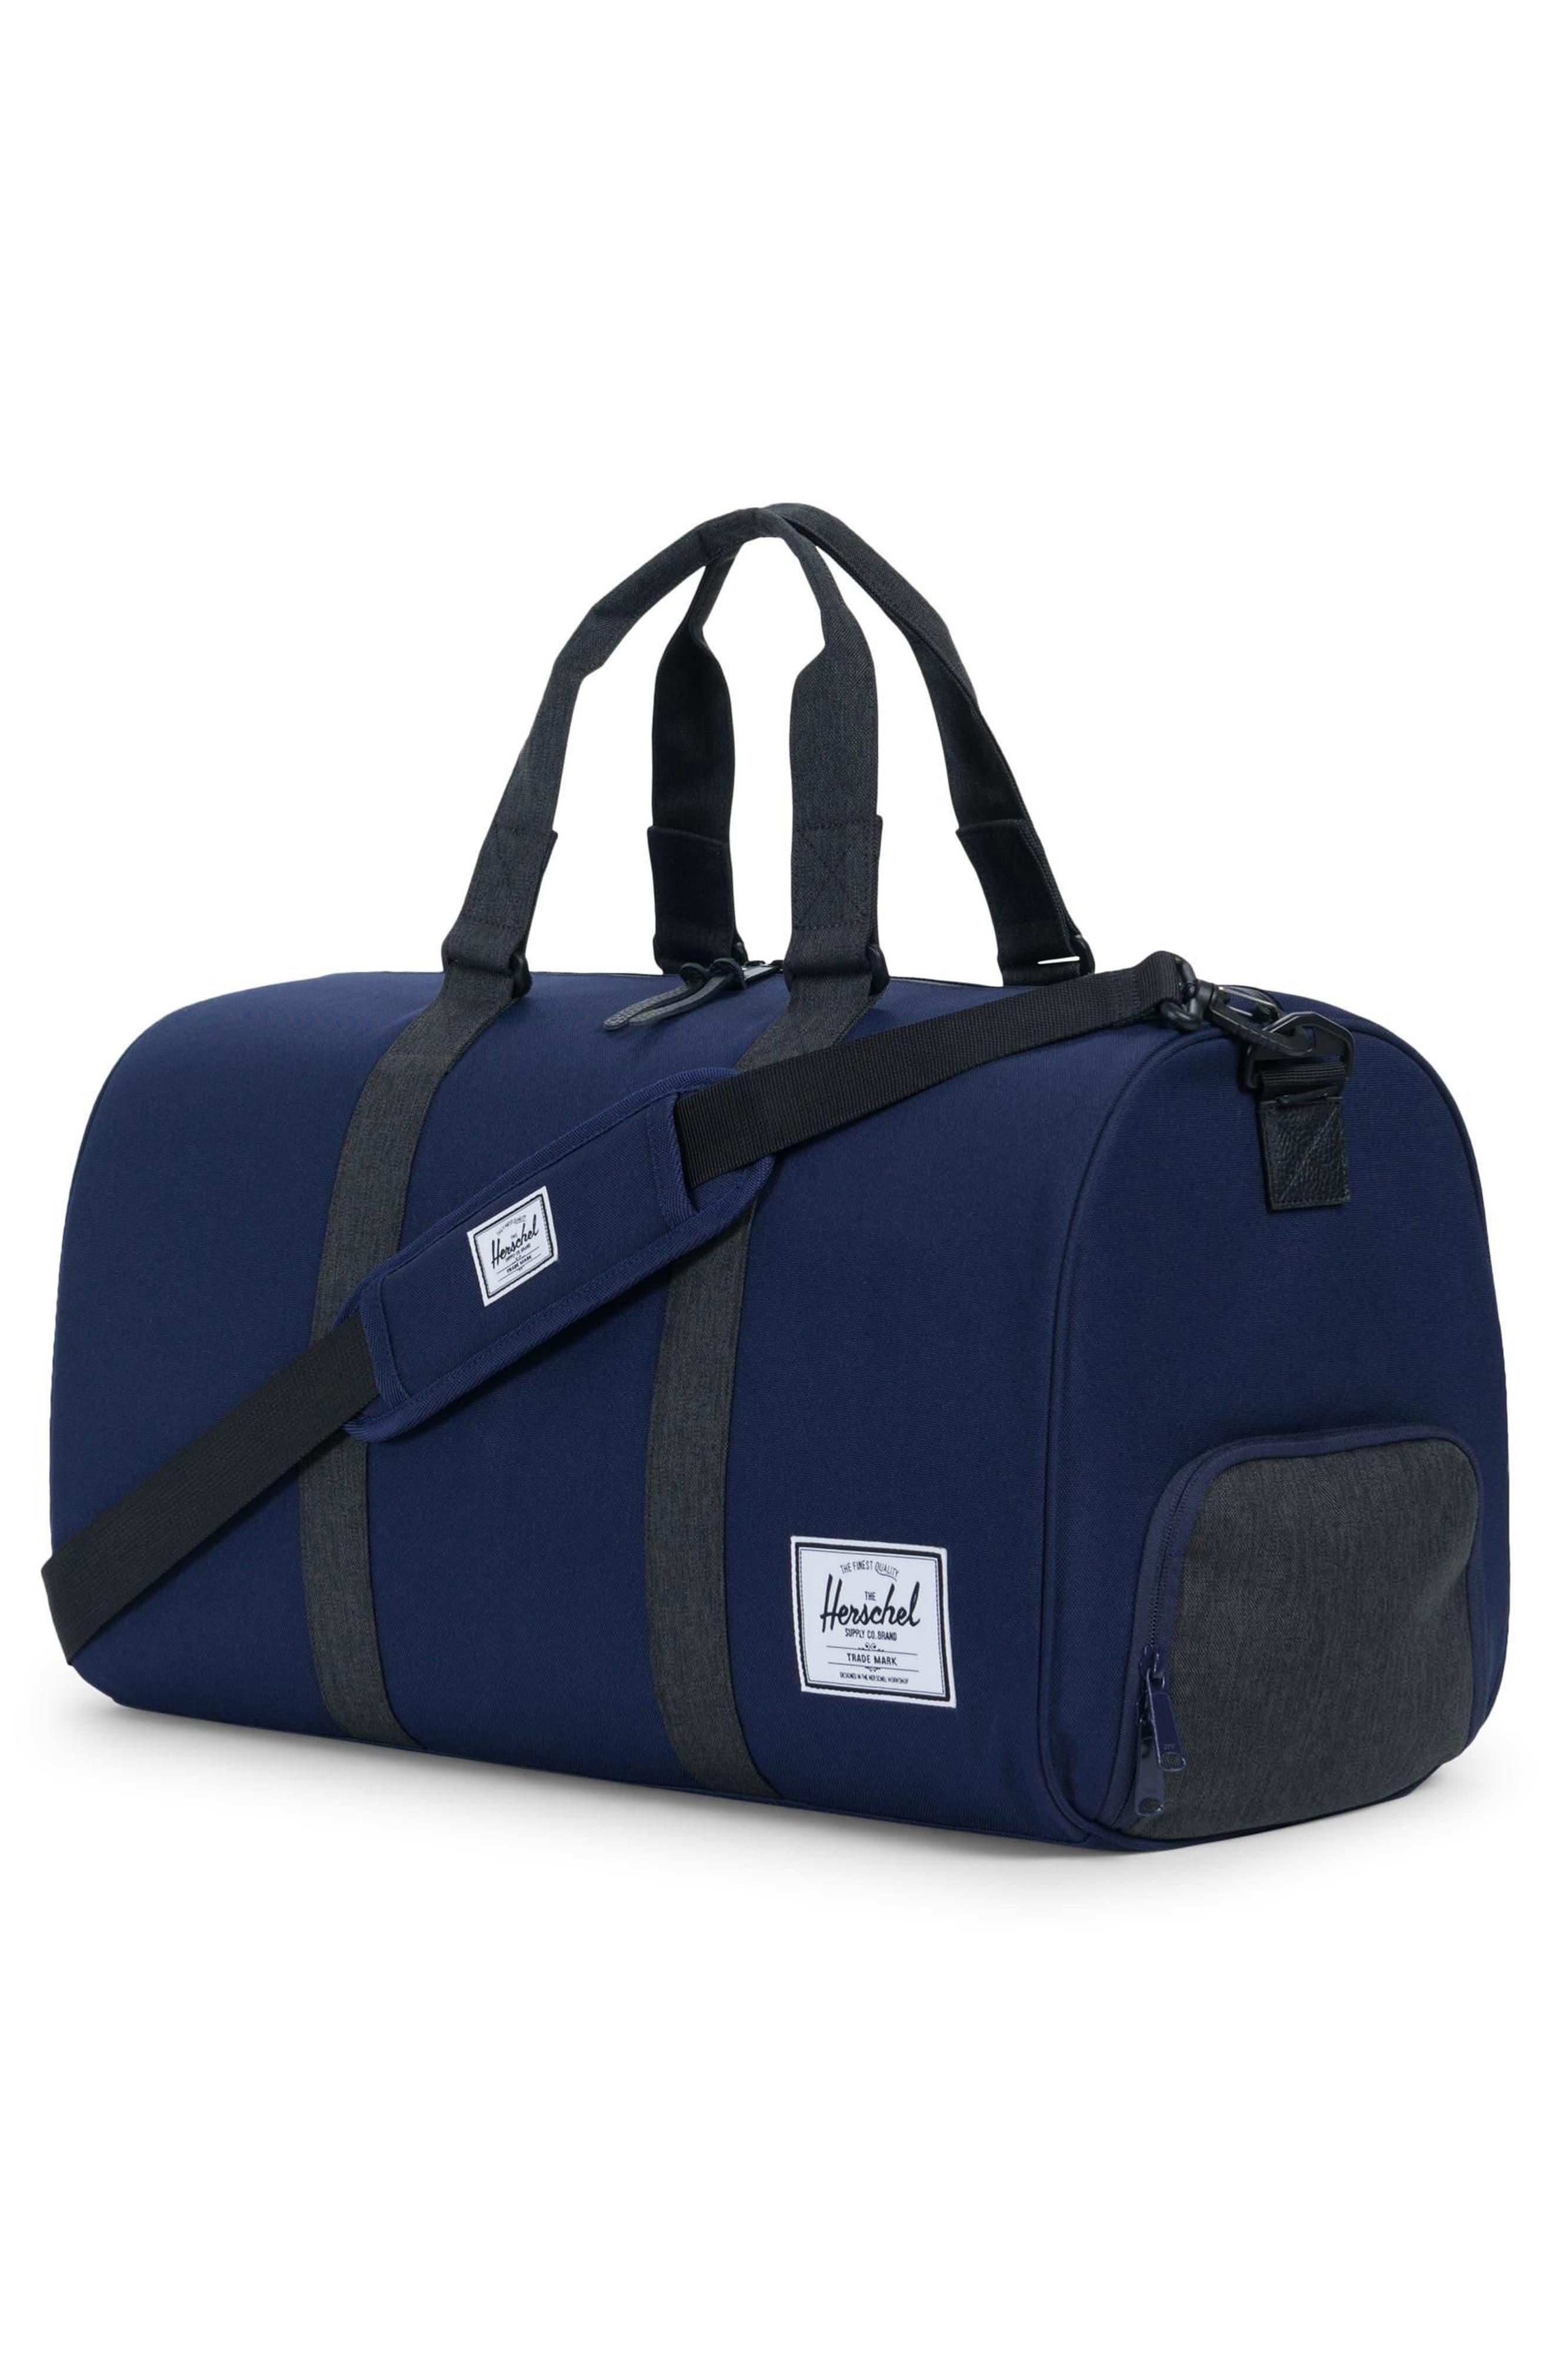 HERSCHEL SUPPLY CO. 'NOVEL' DUFFEL BAG - BLUE, PEA COAT/ BLACK CROSSHATCH